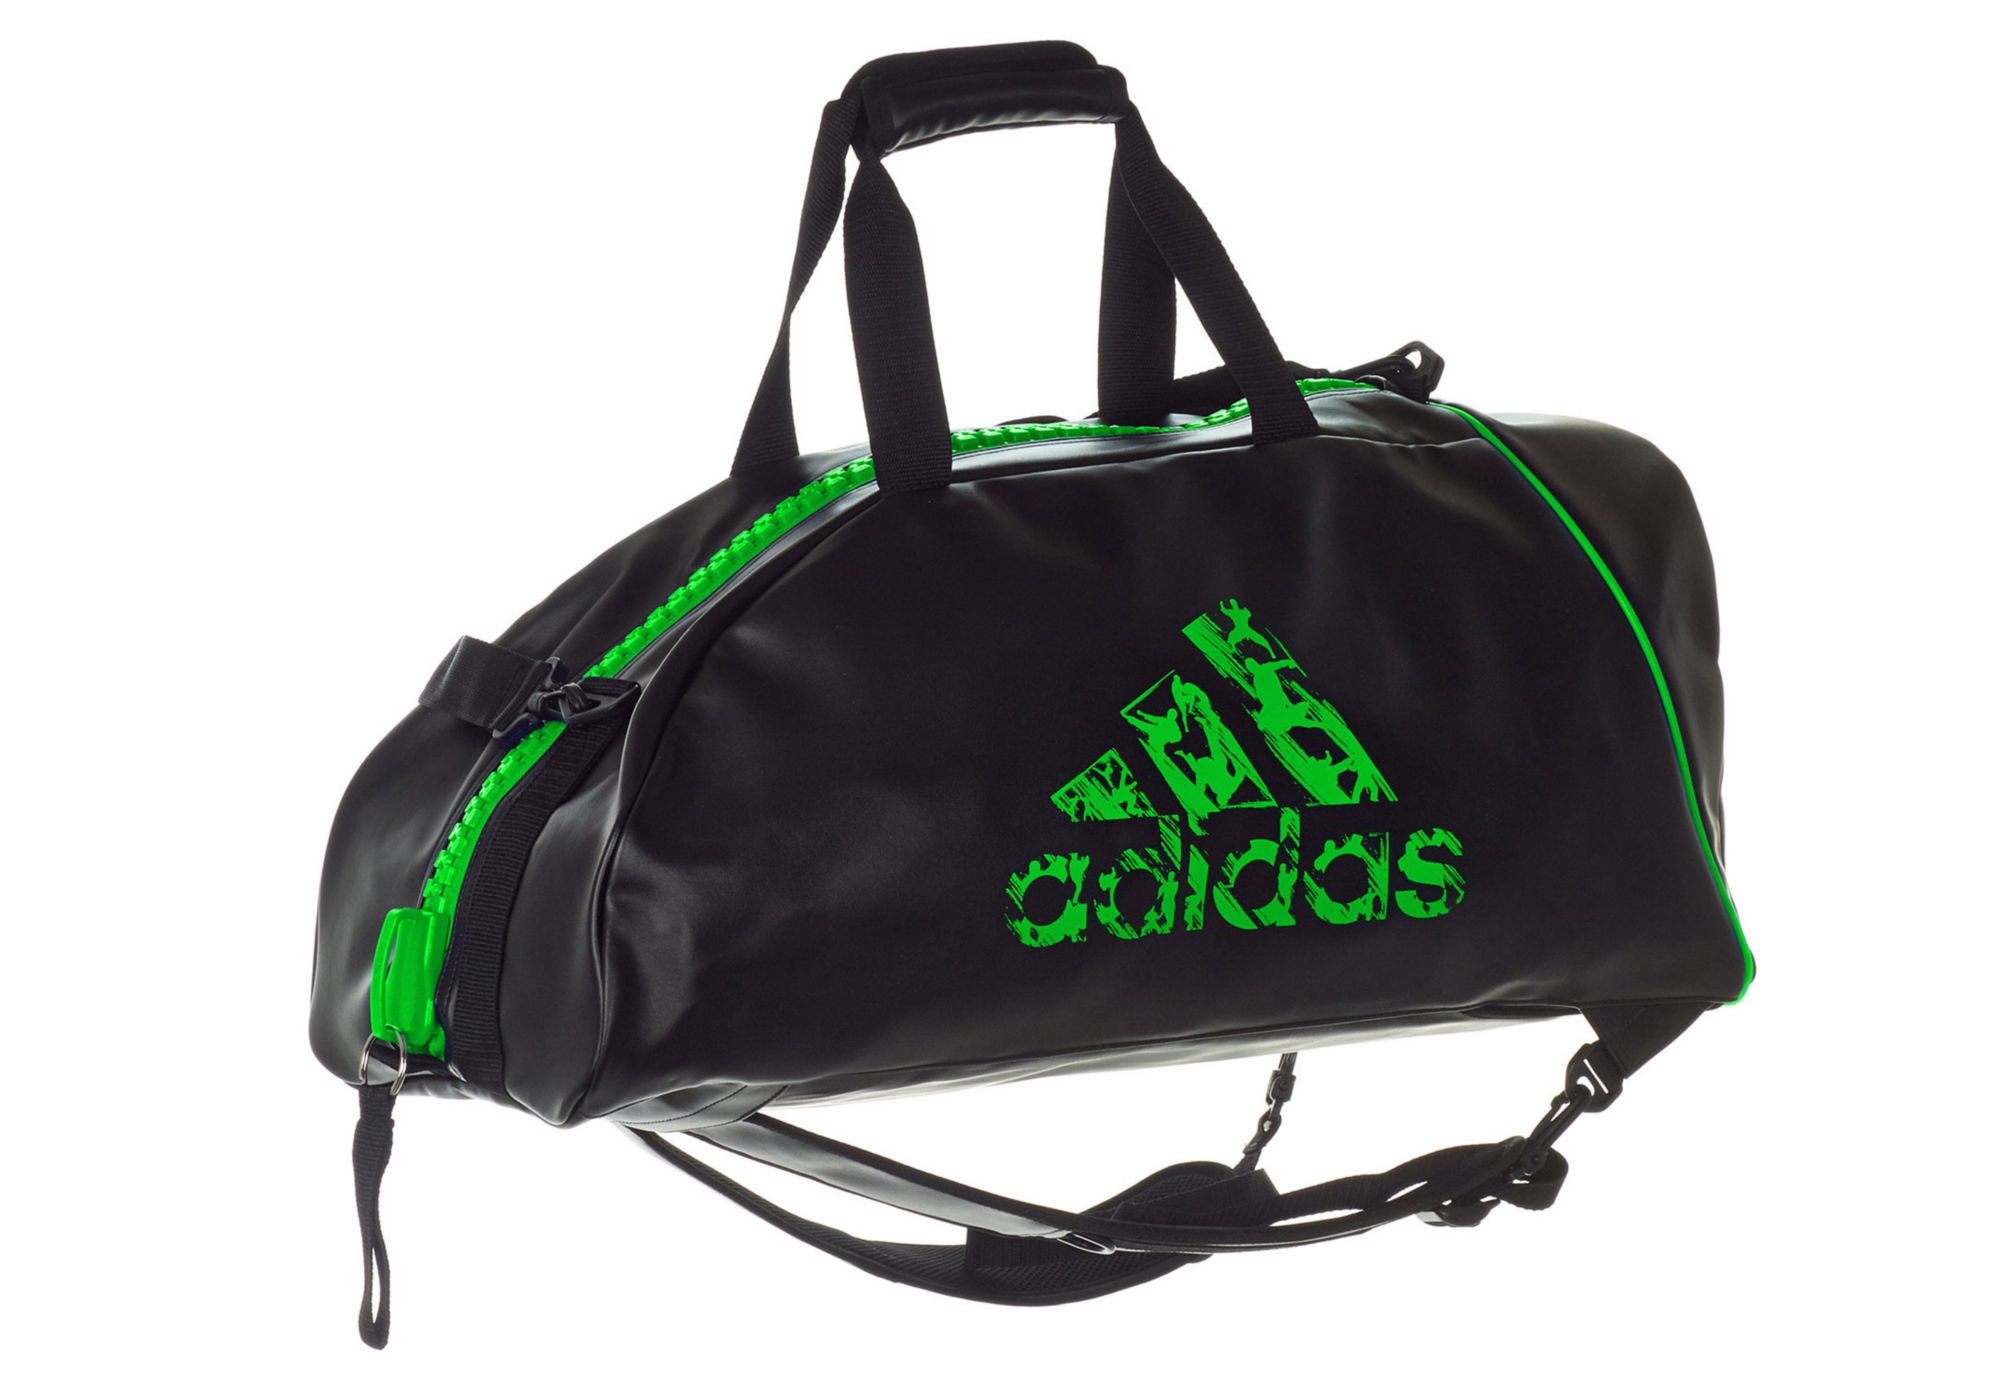 ADIDAS PERFORMANCE Adidas Performance Sporttasche, »ADIACC051 grün«